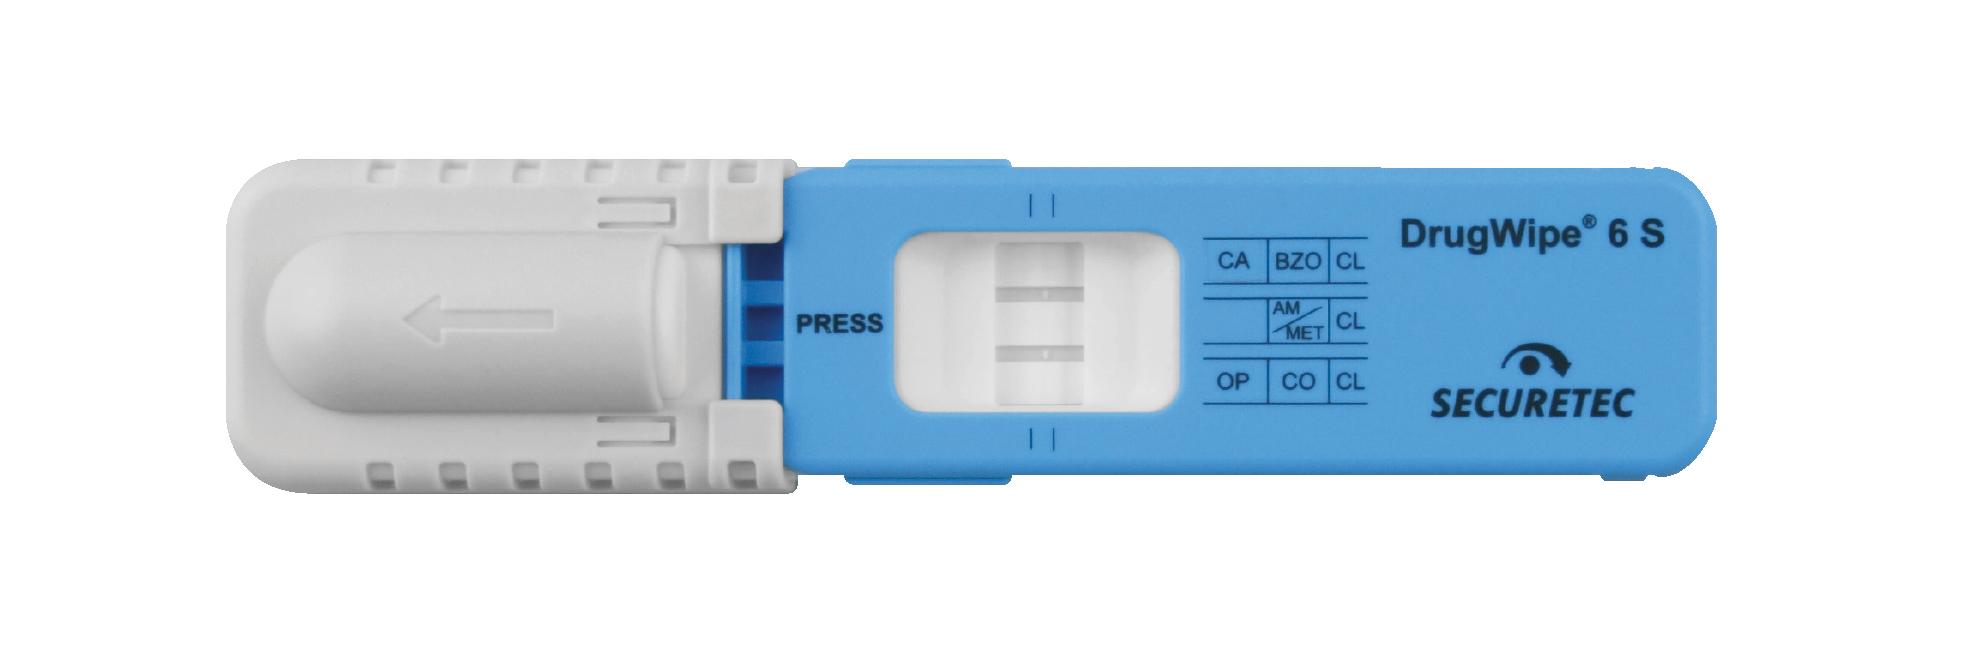 DrugWipe6S604